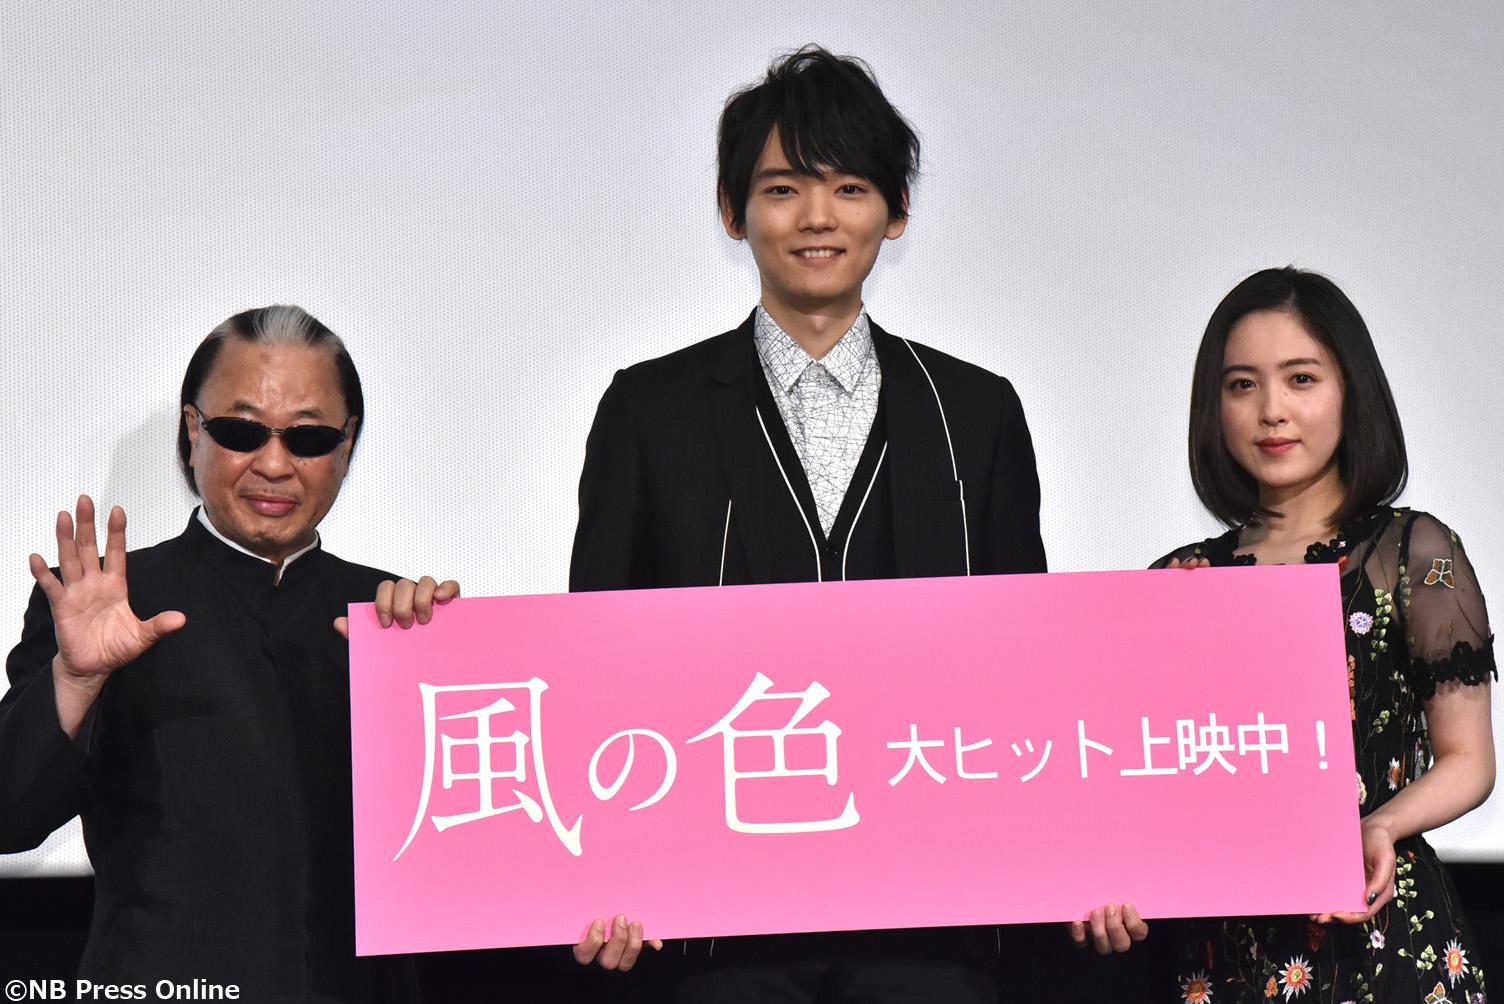 Mr.マリック・古川雄輝・藤井武美 - 映画『風の色』初日舞台挨拶